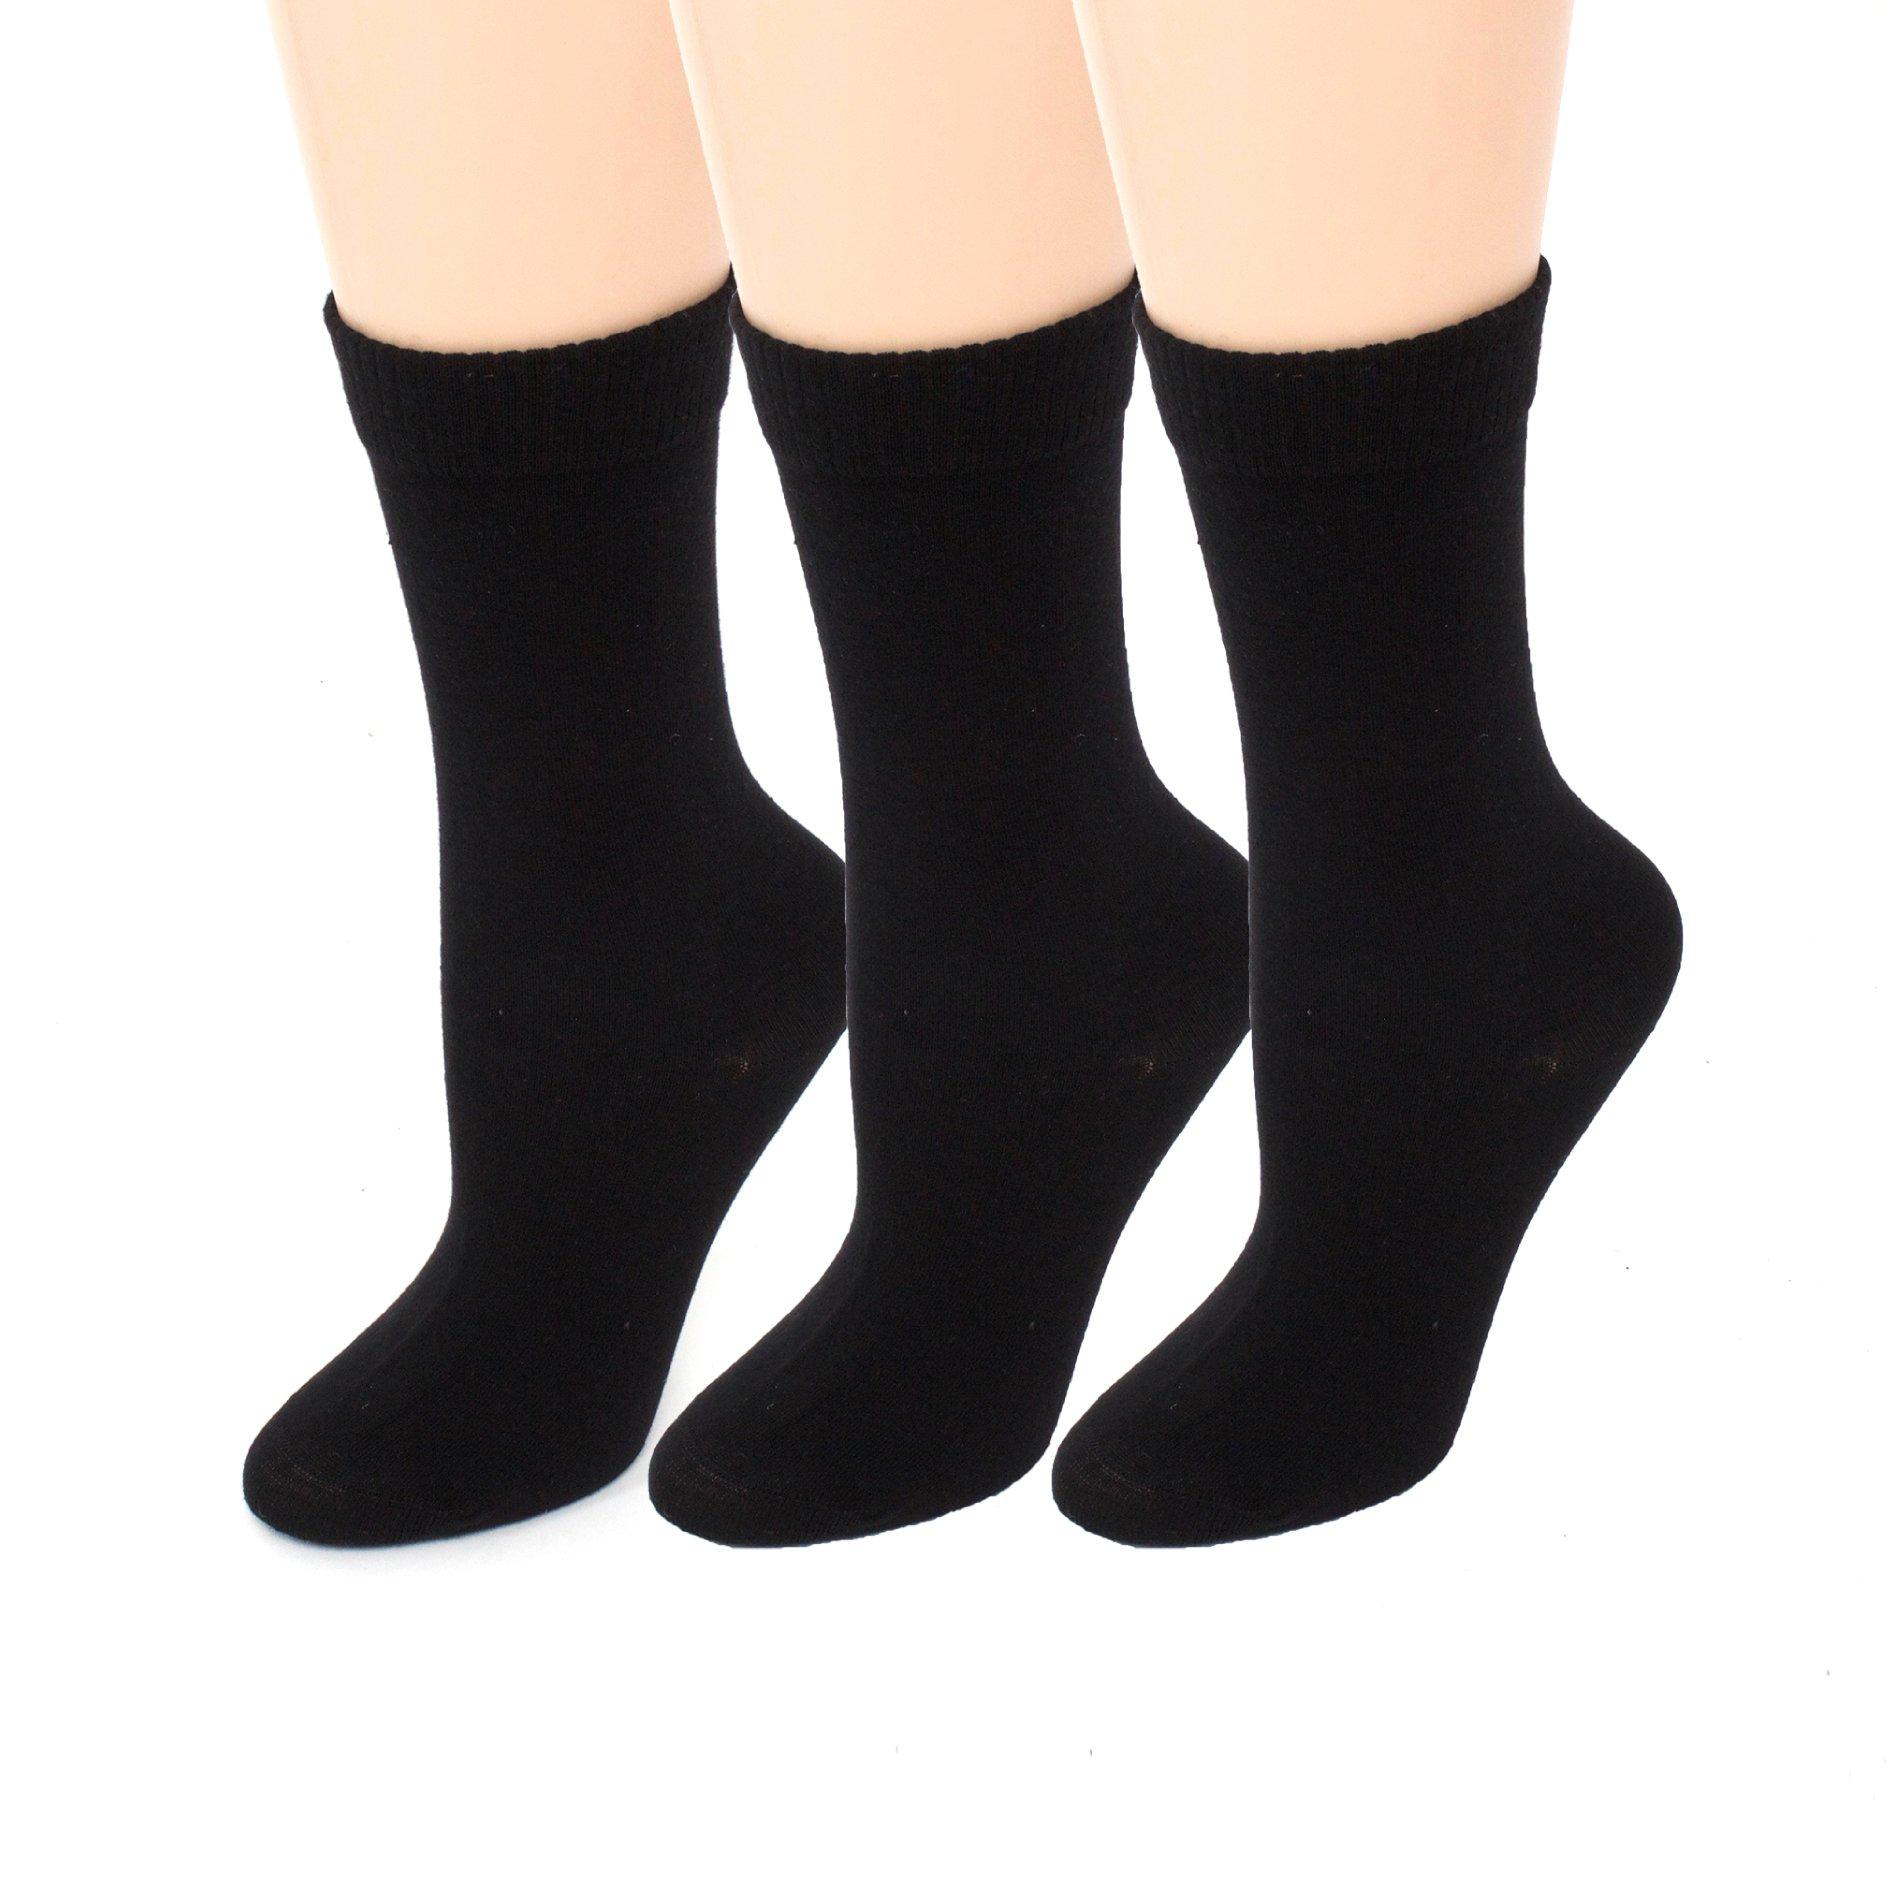 Diabetic Socks   Womens Black Crew 3 Pack   Seamless Toe   Non-Binding Top   Sock Size 9-11   Improve Foot Health Comfort Circulation for Diabetes, Varicose Veins, Maternity Pregnancy